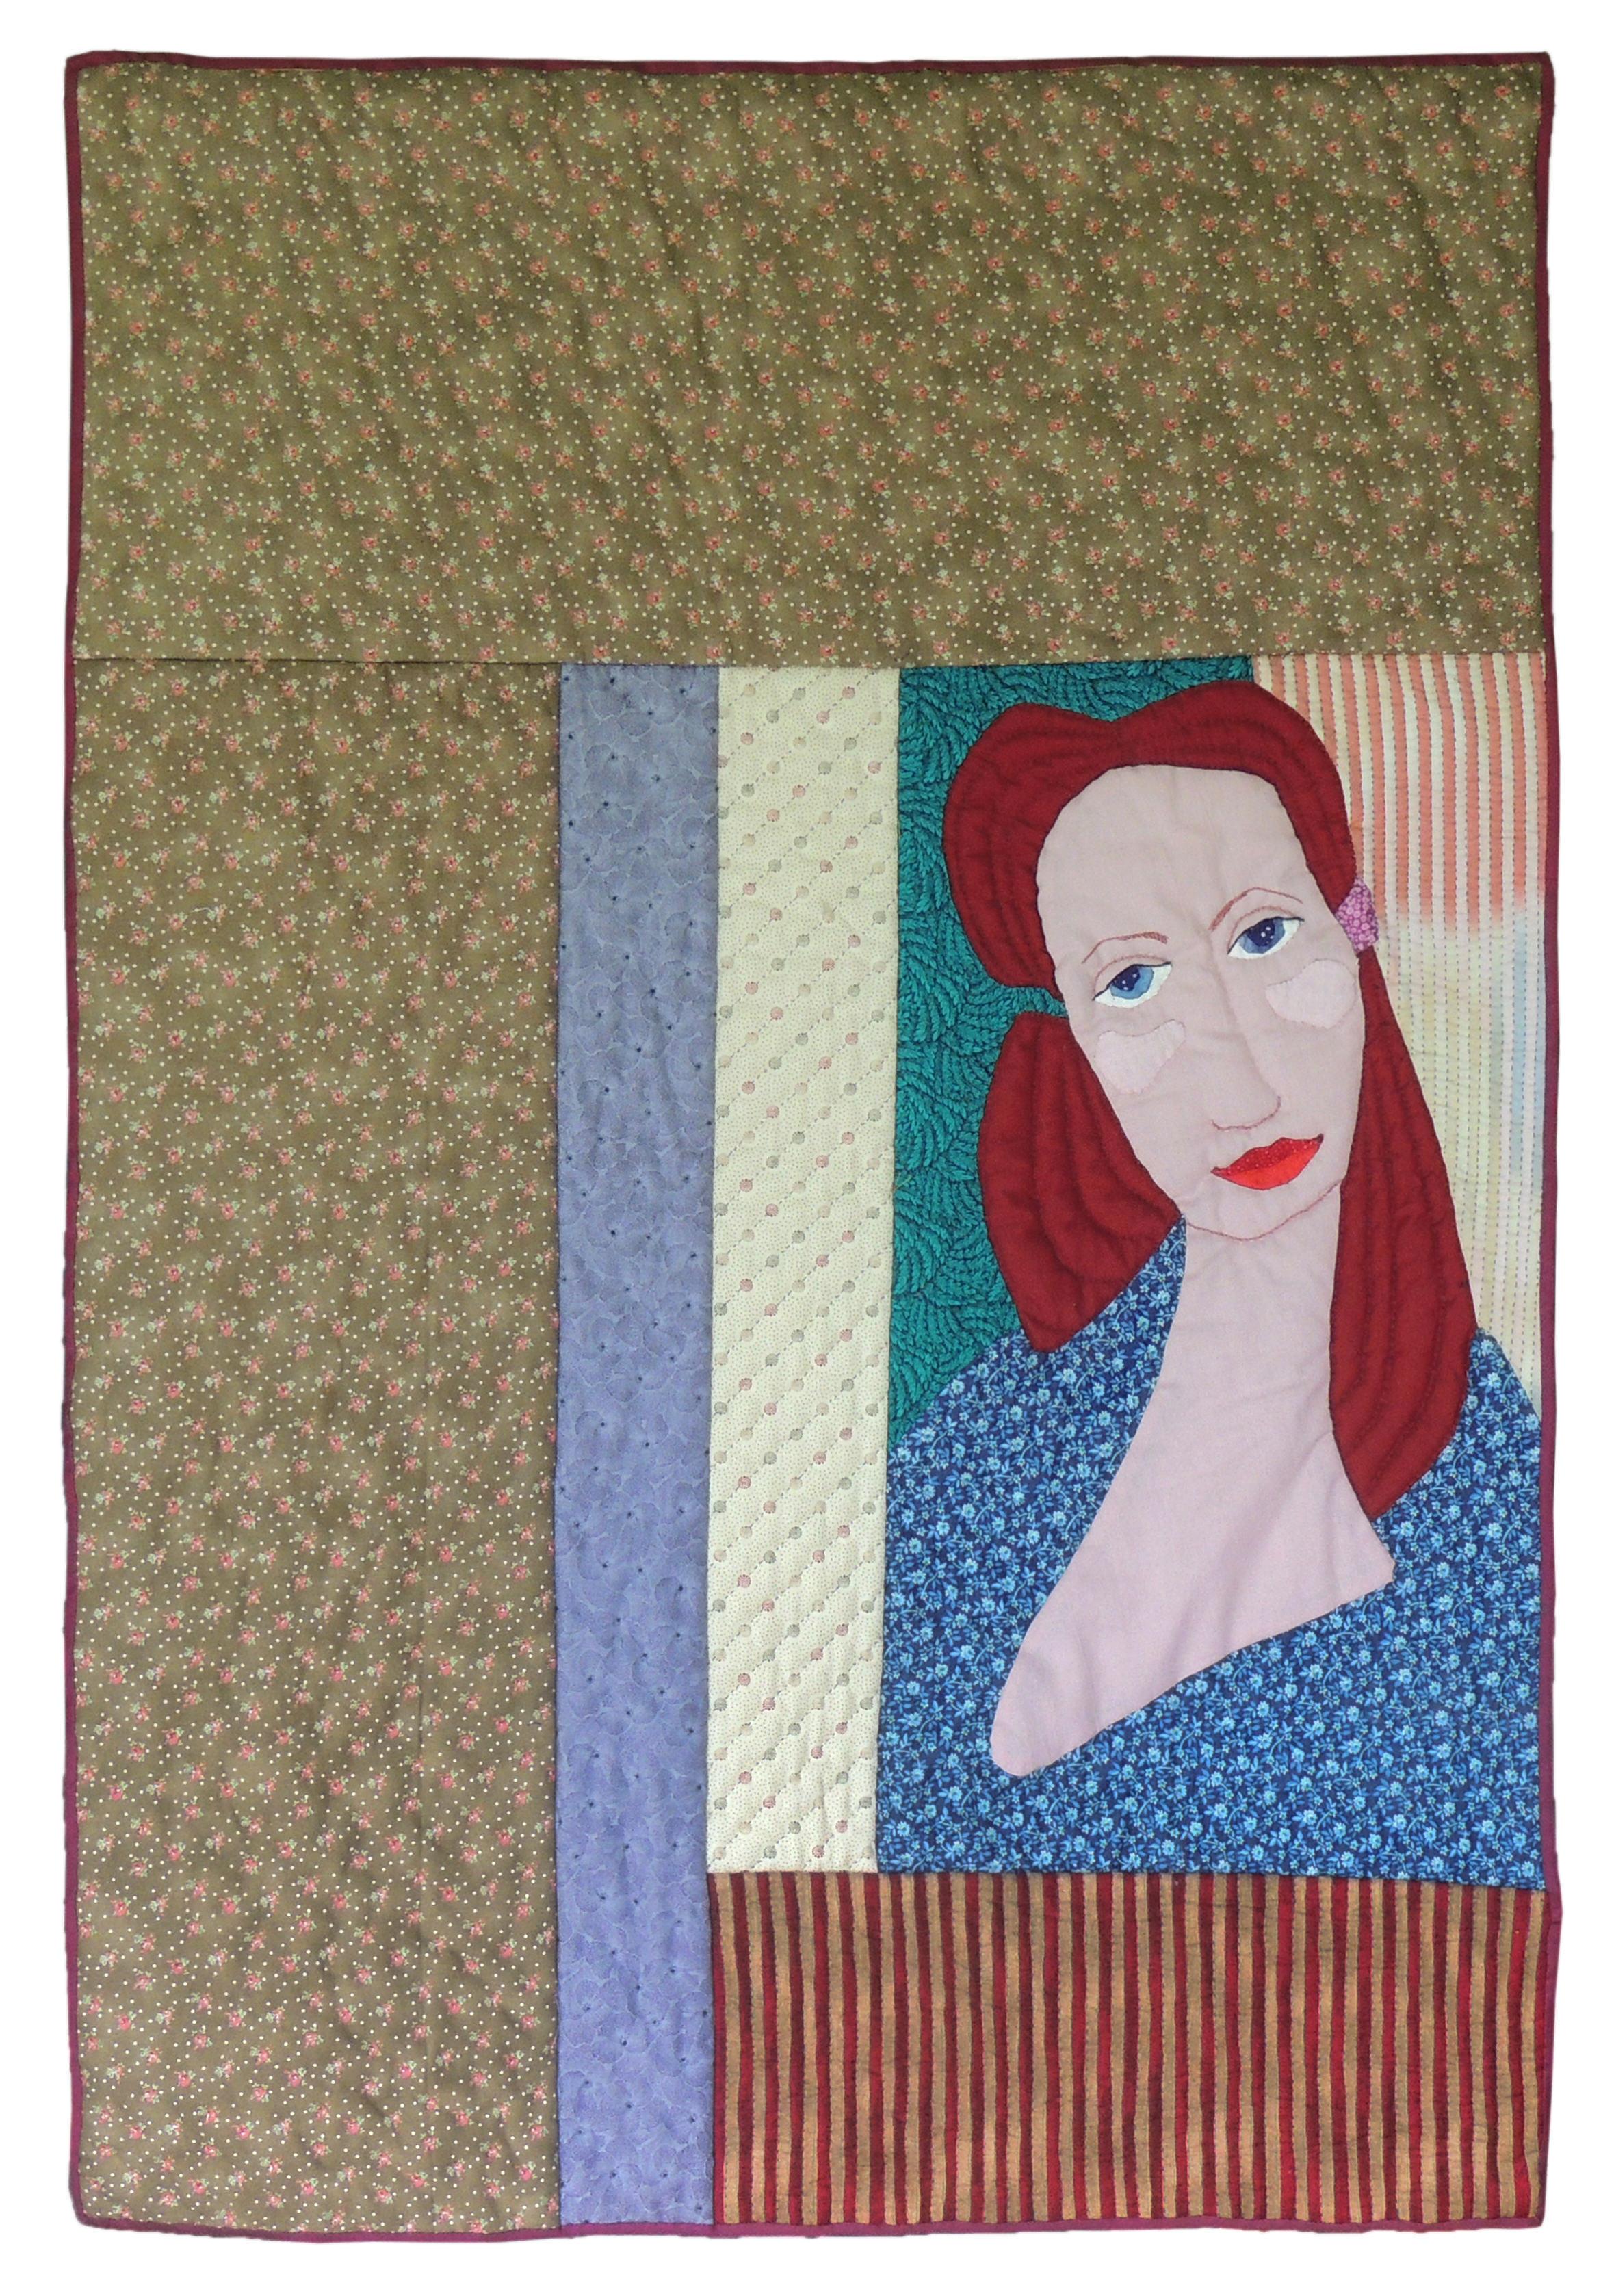 "Marianne Rabb Britton | PORTRAIT | Fabric & Embroidery | 38.5 x 27"" | Estate of Marianne Rabb Britton"